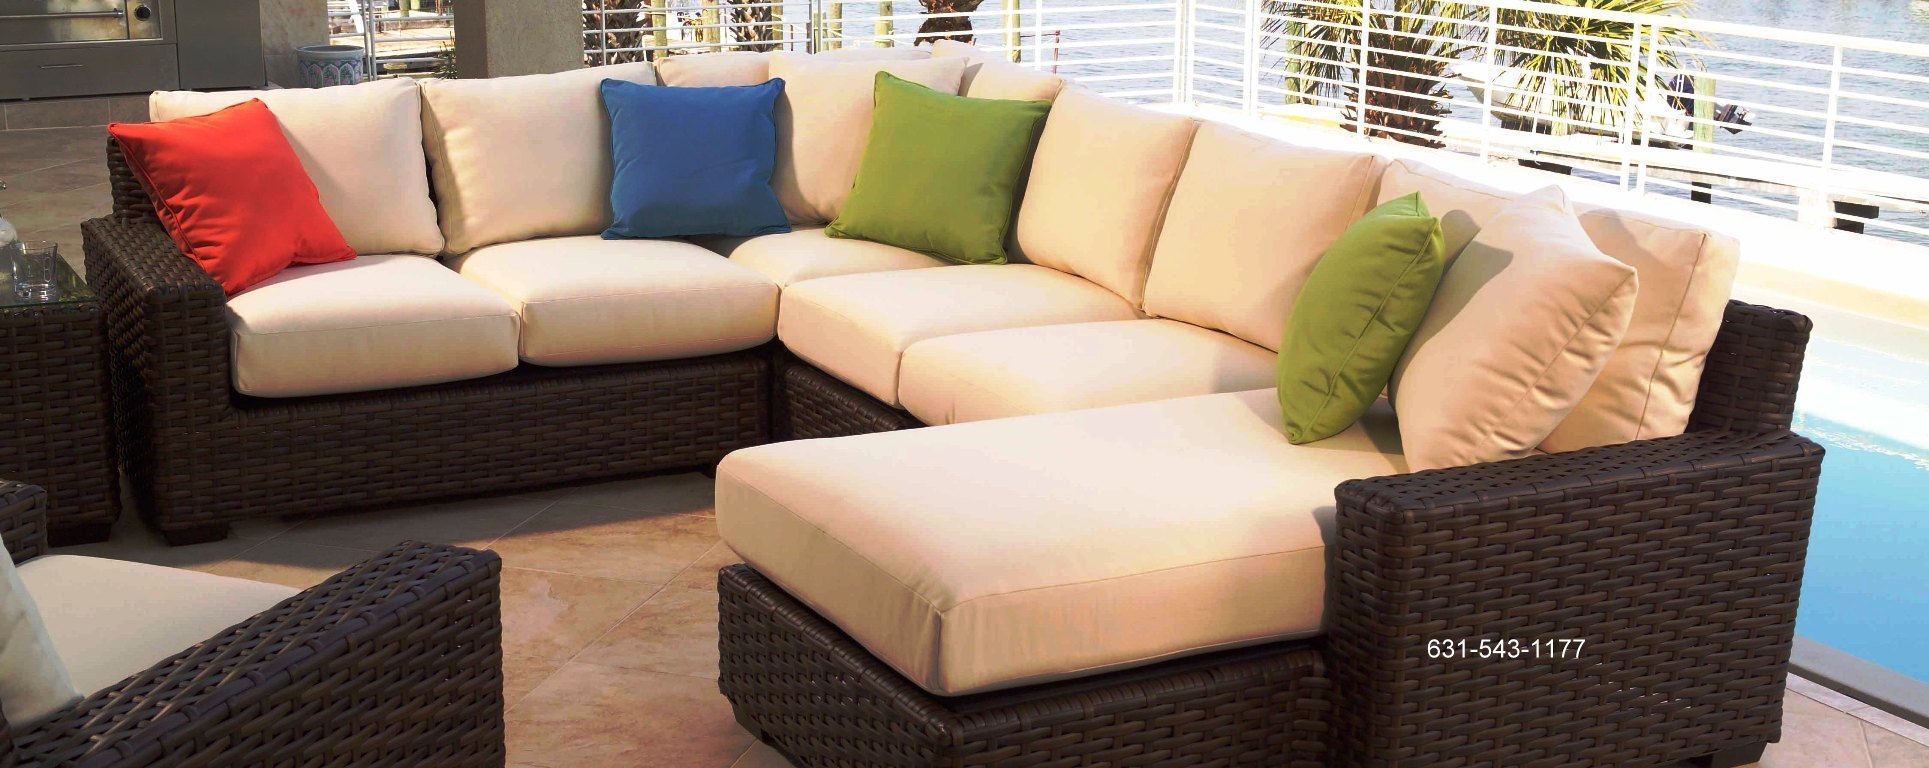 Rattana Outdoor Furniture Nassau County, Suffolk County Long Island NY